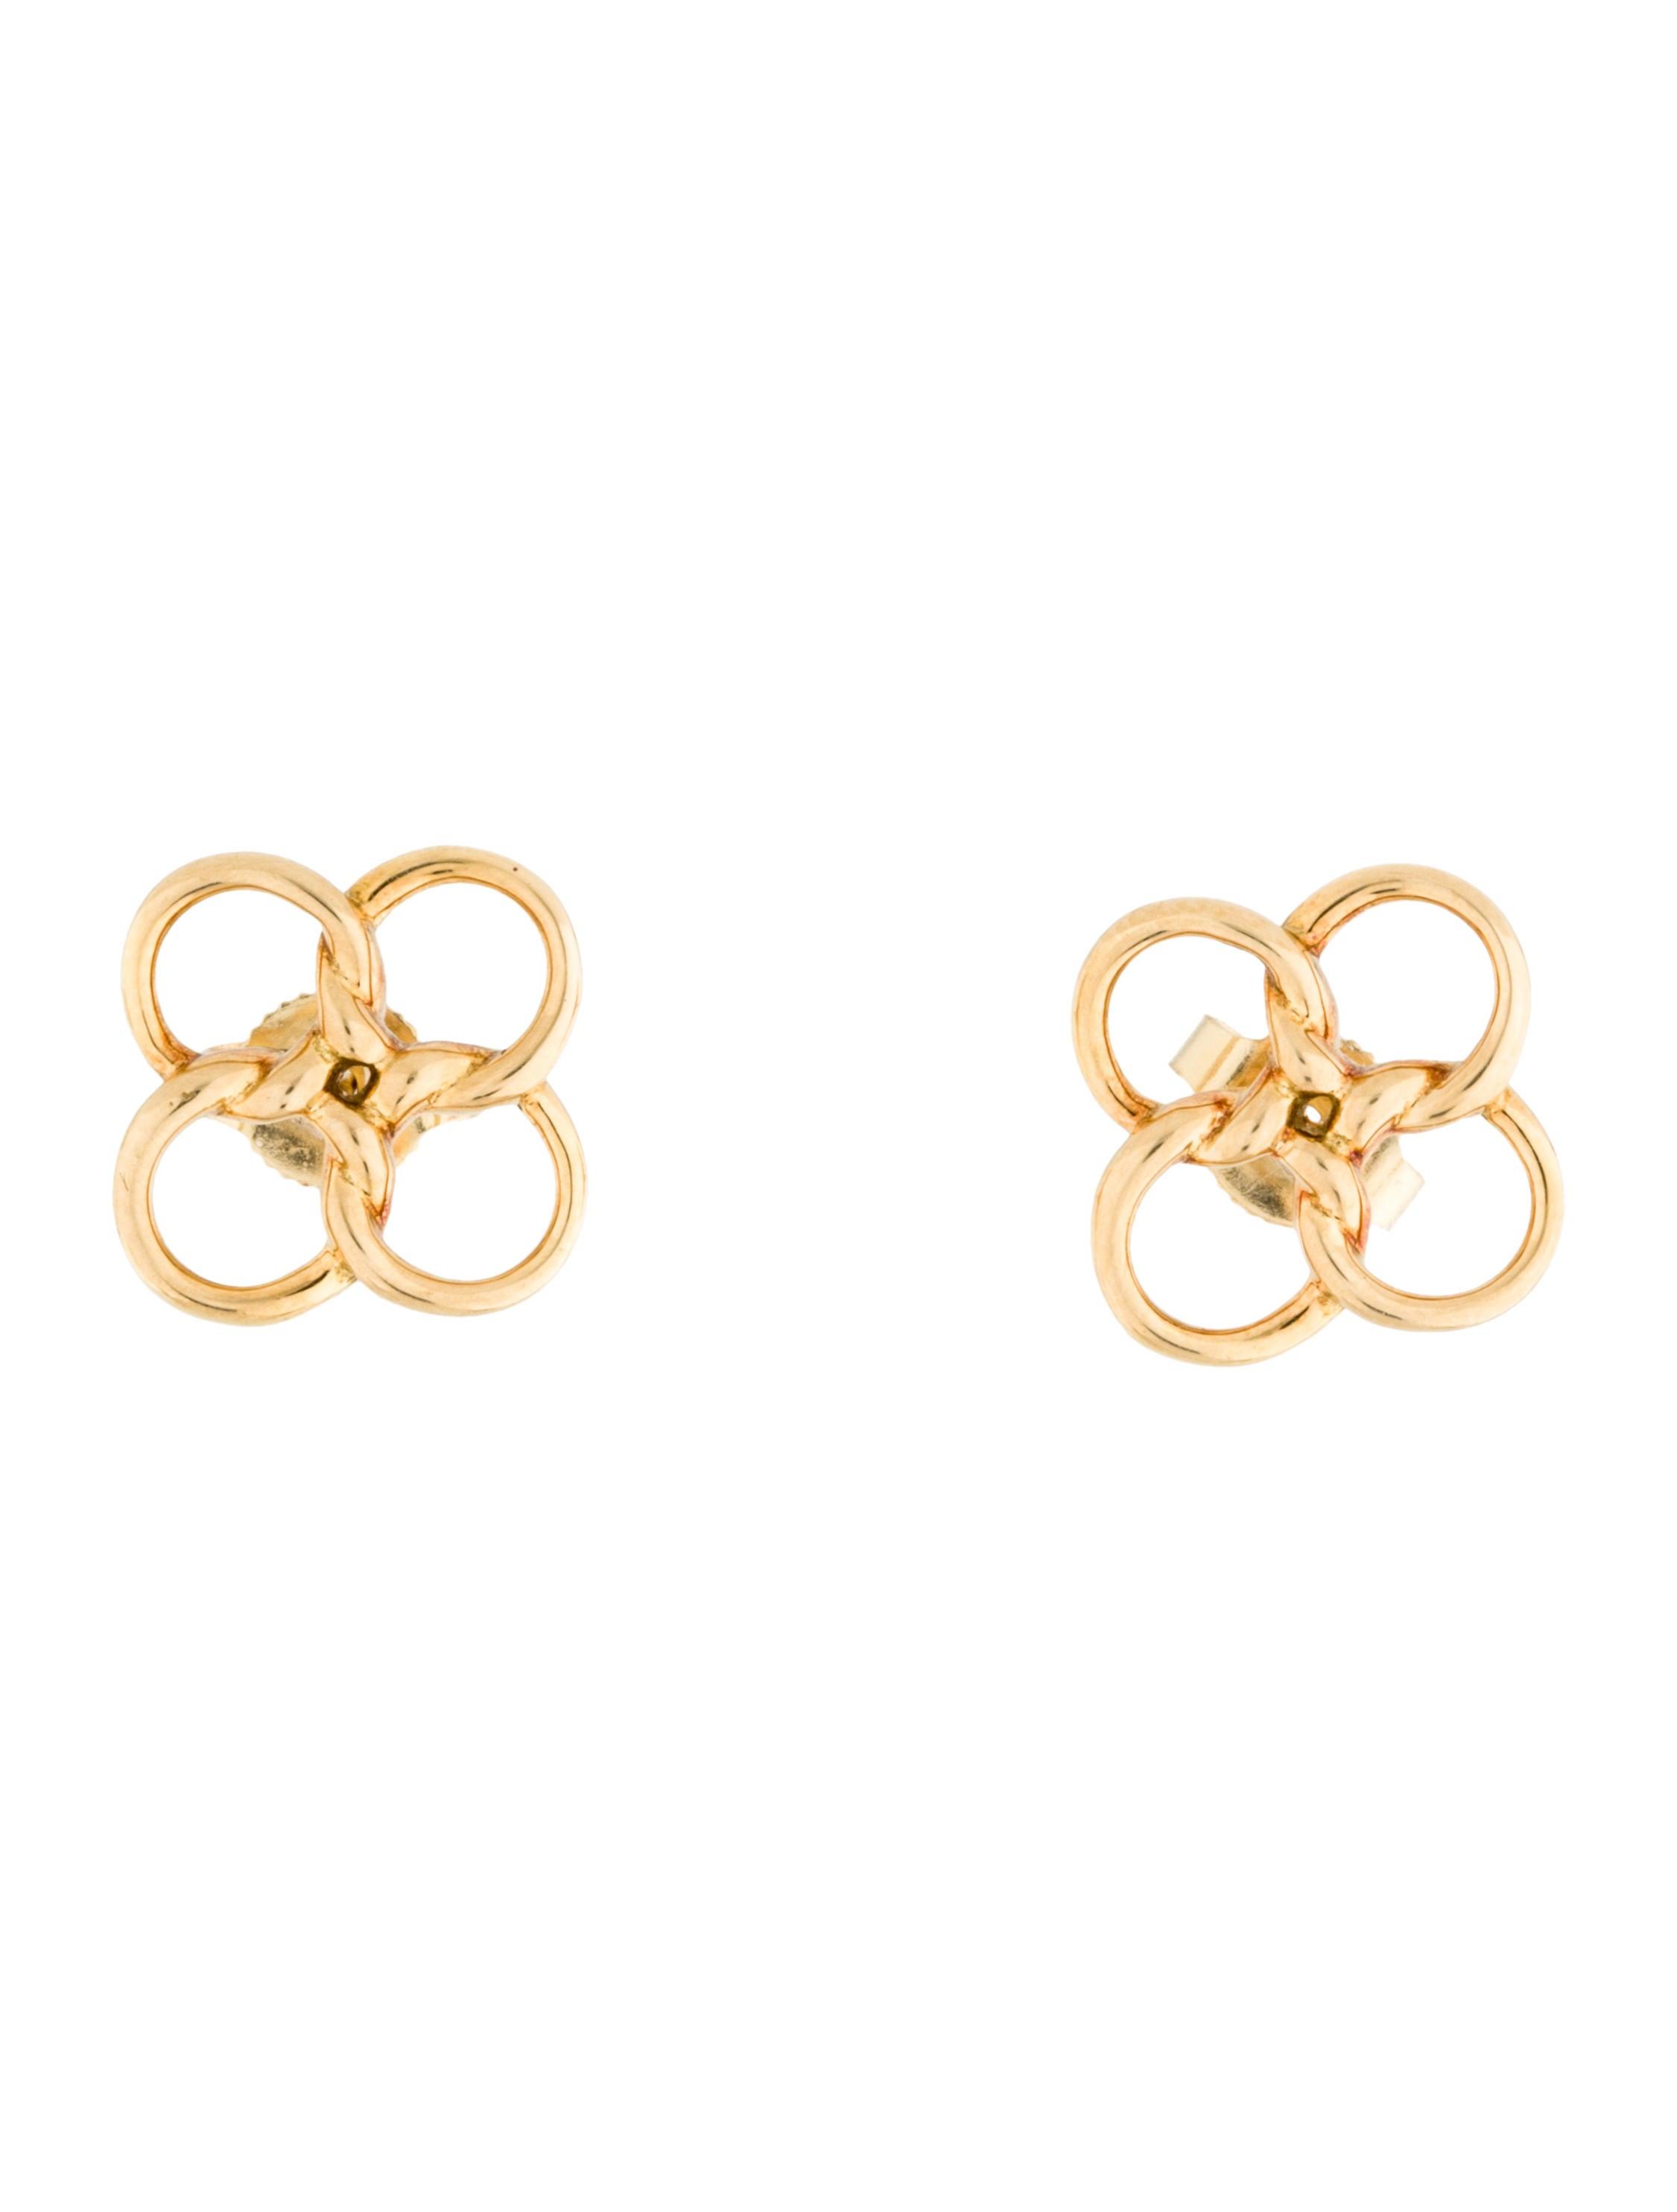 bac3ca89d Tiffany & Co. Quadrifoglio Earrings - Earrings - TIF33450 | The RealReal